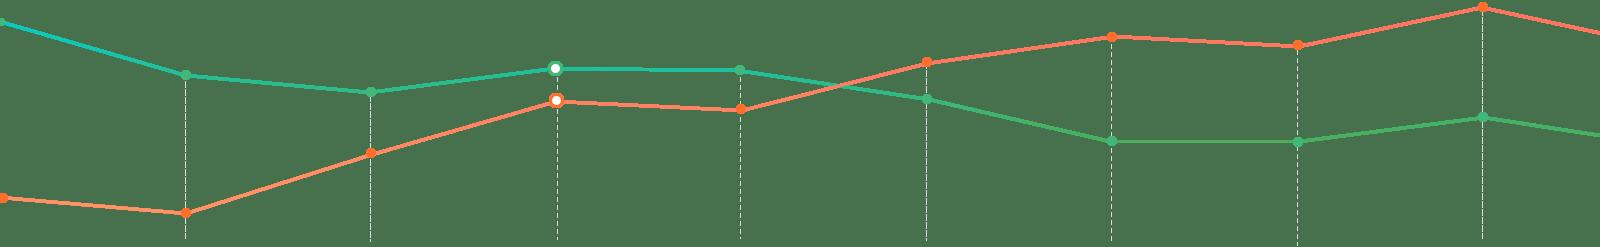 graph separator